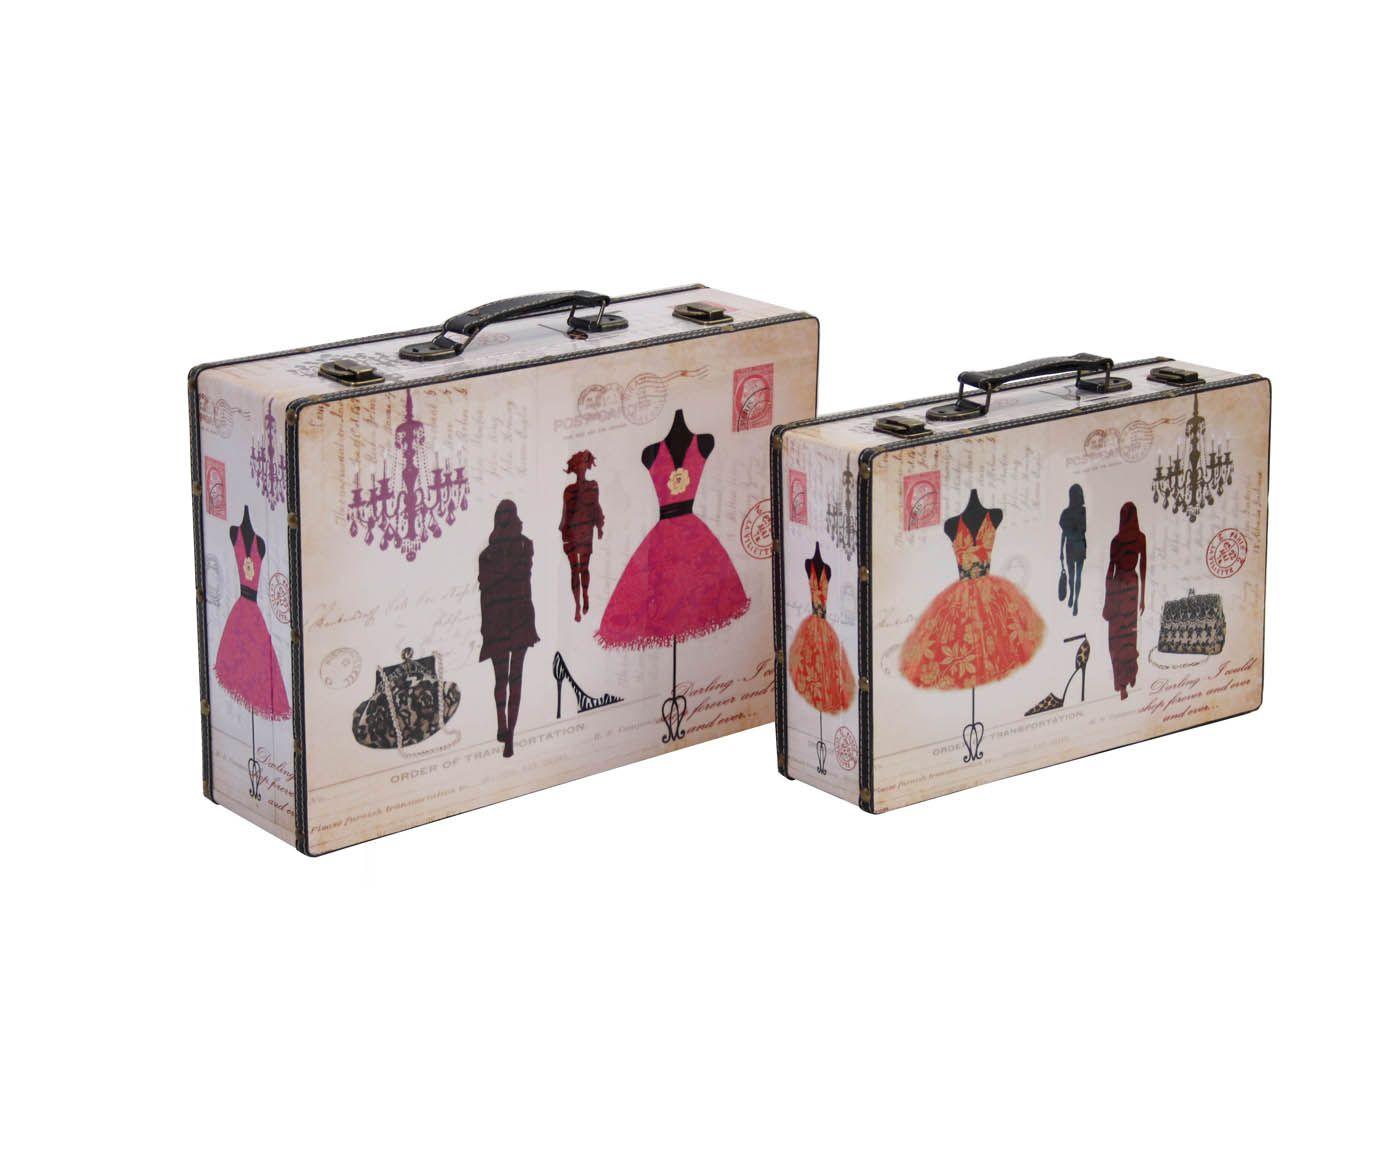 Montmartre - wooden suitcases -  42X12X31 cm and 37.5X10.5X25 cm